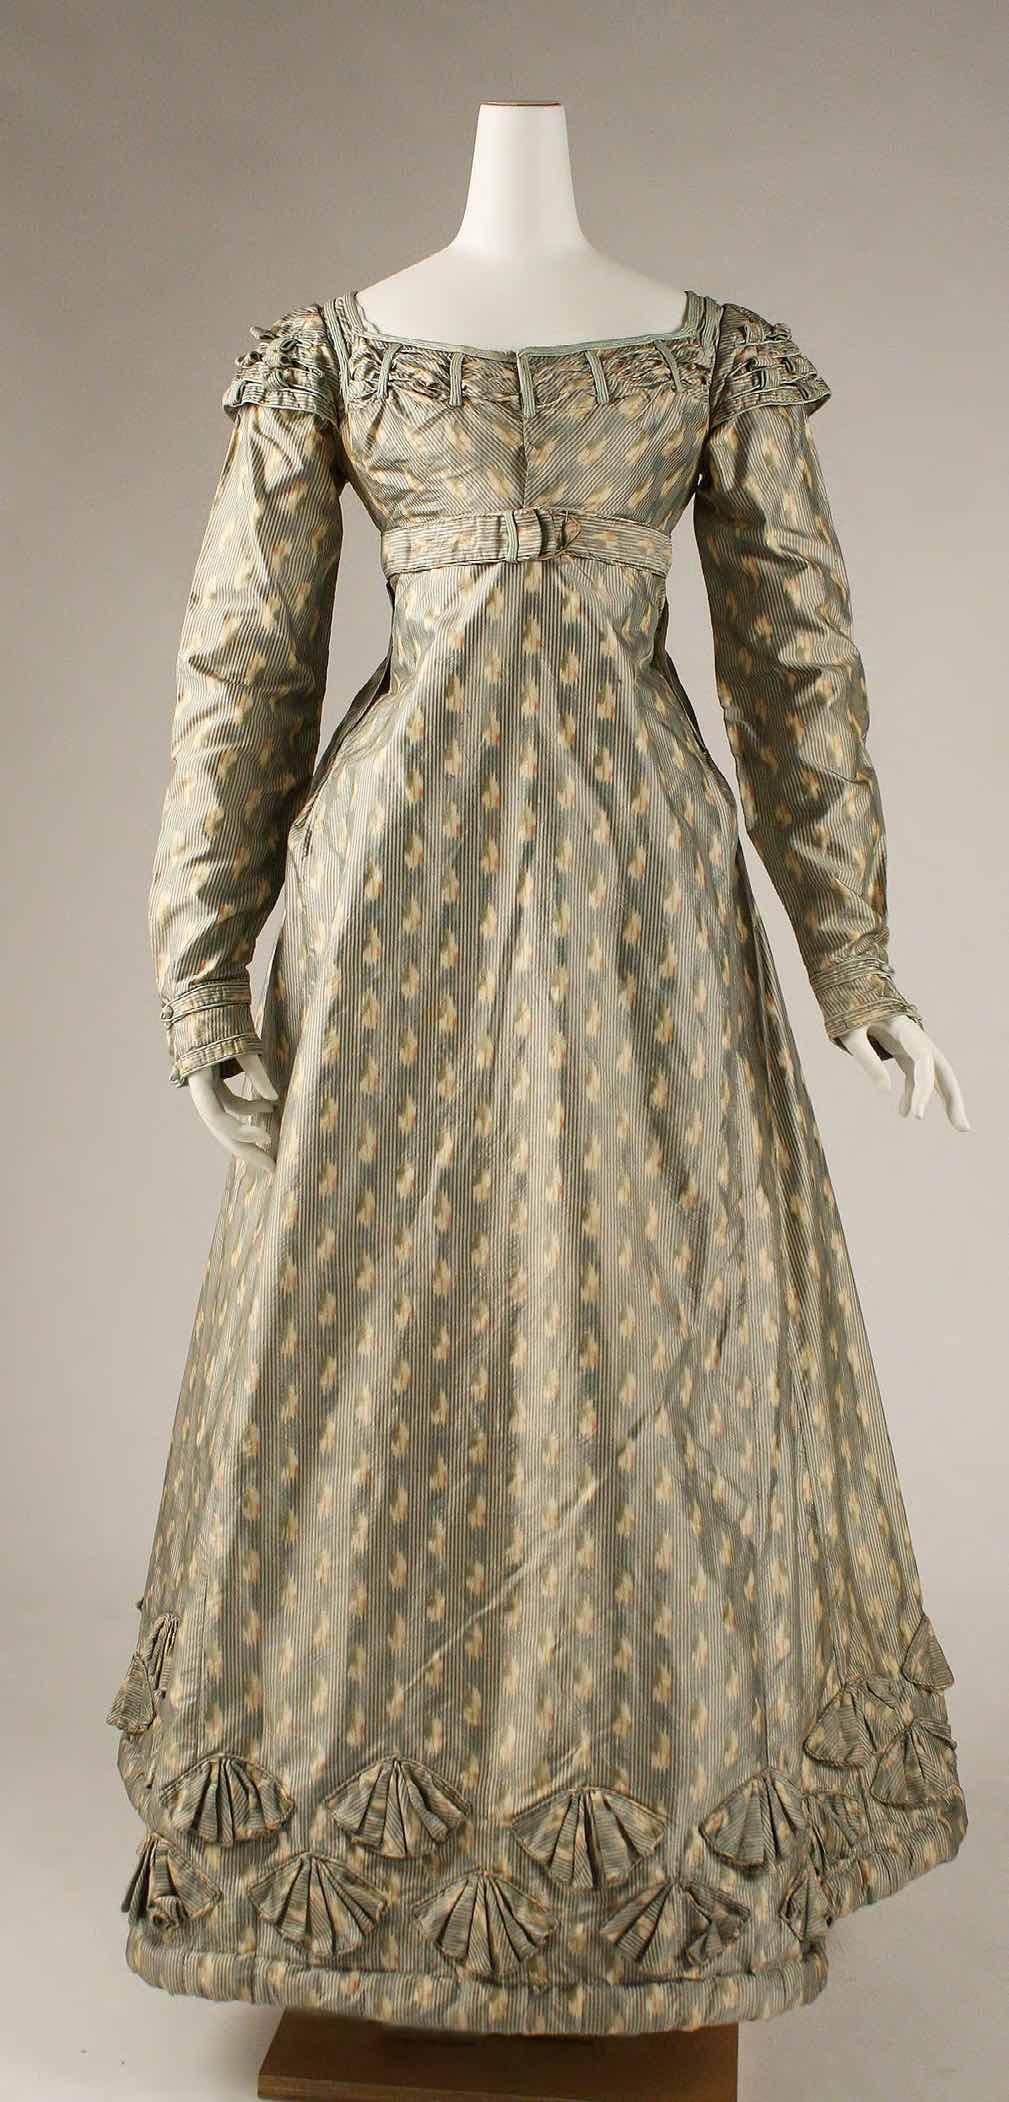 Dress, circa 1820 (fabric from late 18th century), British. Silk. The Metropolitan Museum of Art, New York, Purchase, Irene Lewisohn Bequest.